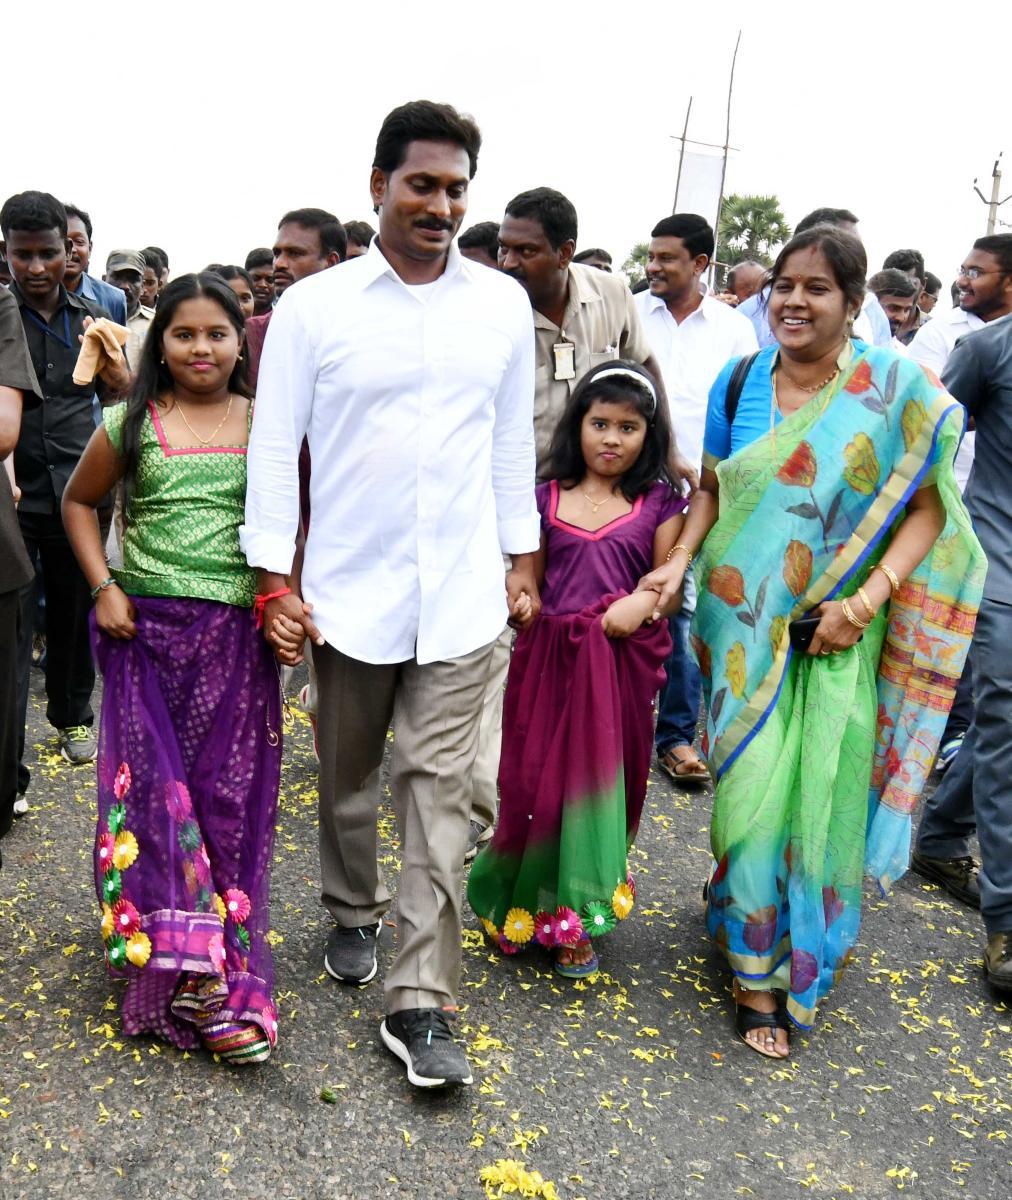 Jaganmohan Reddy in Kaligiri during the padayatra on Tuesday. DH PHOTO/FILE